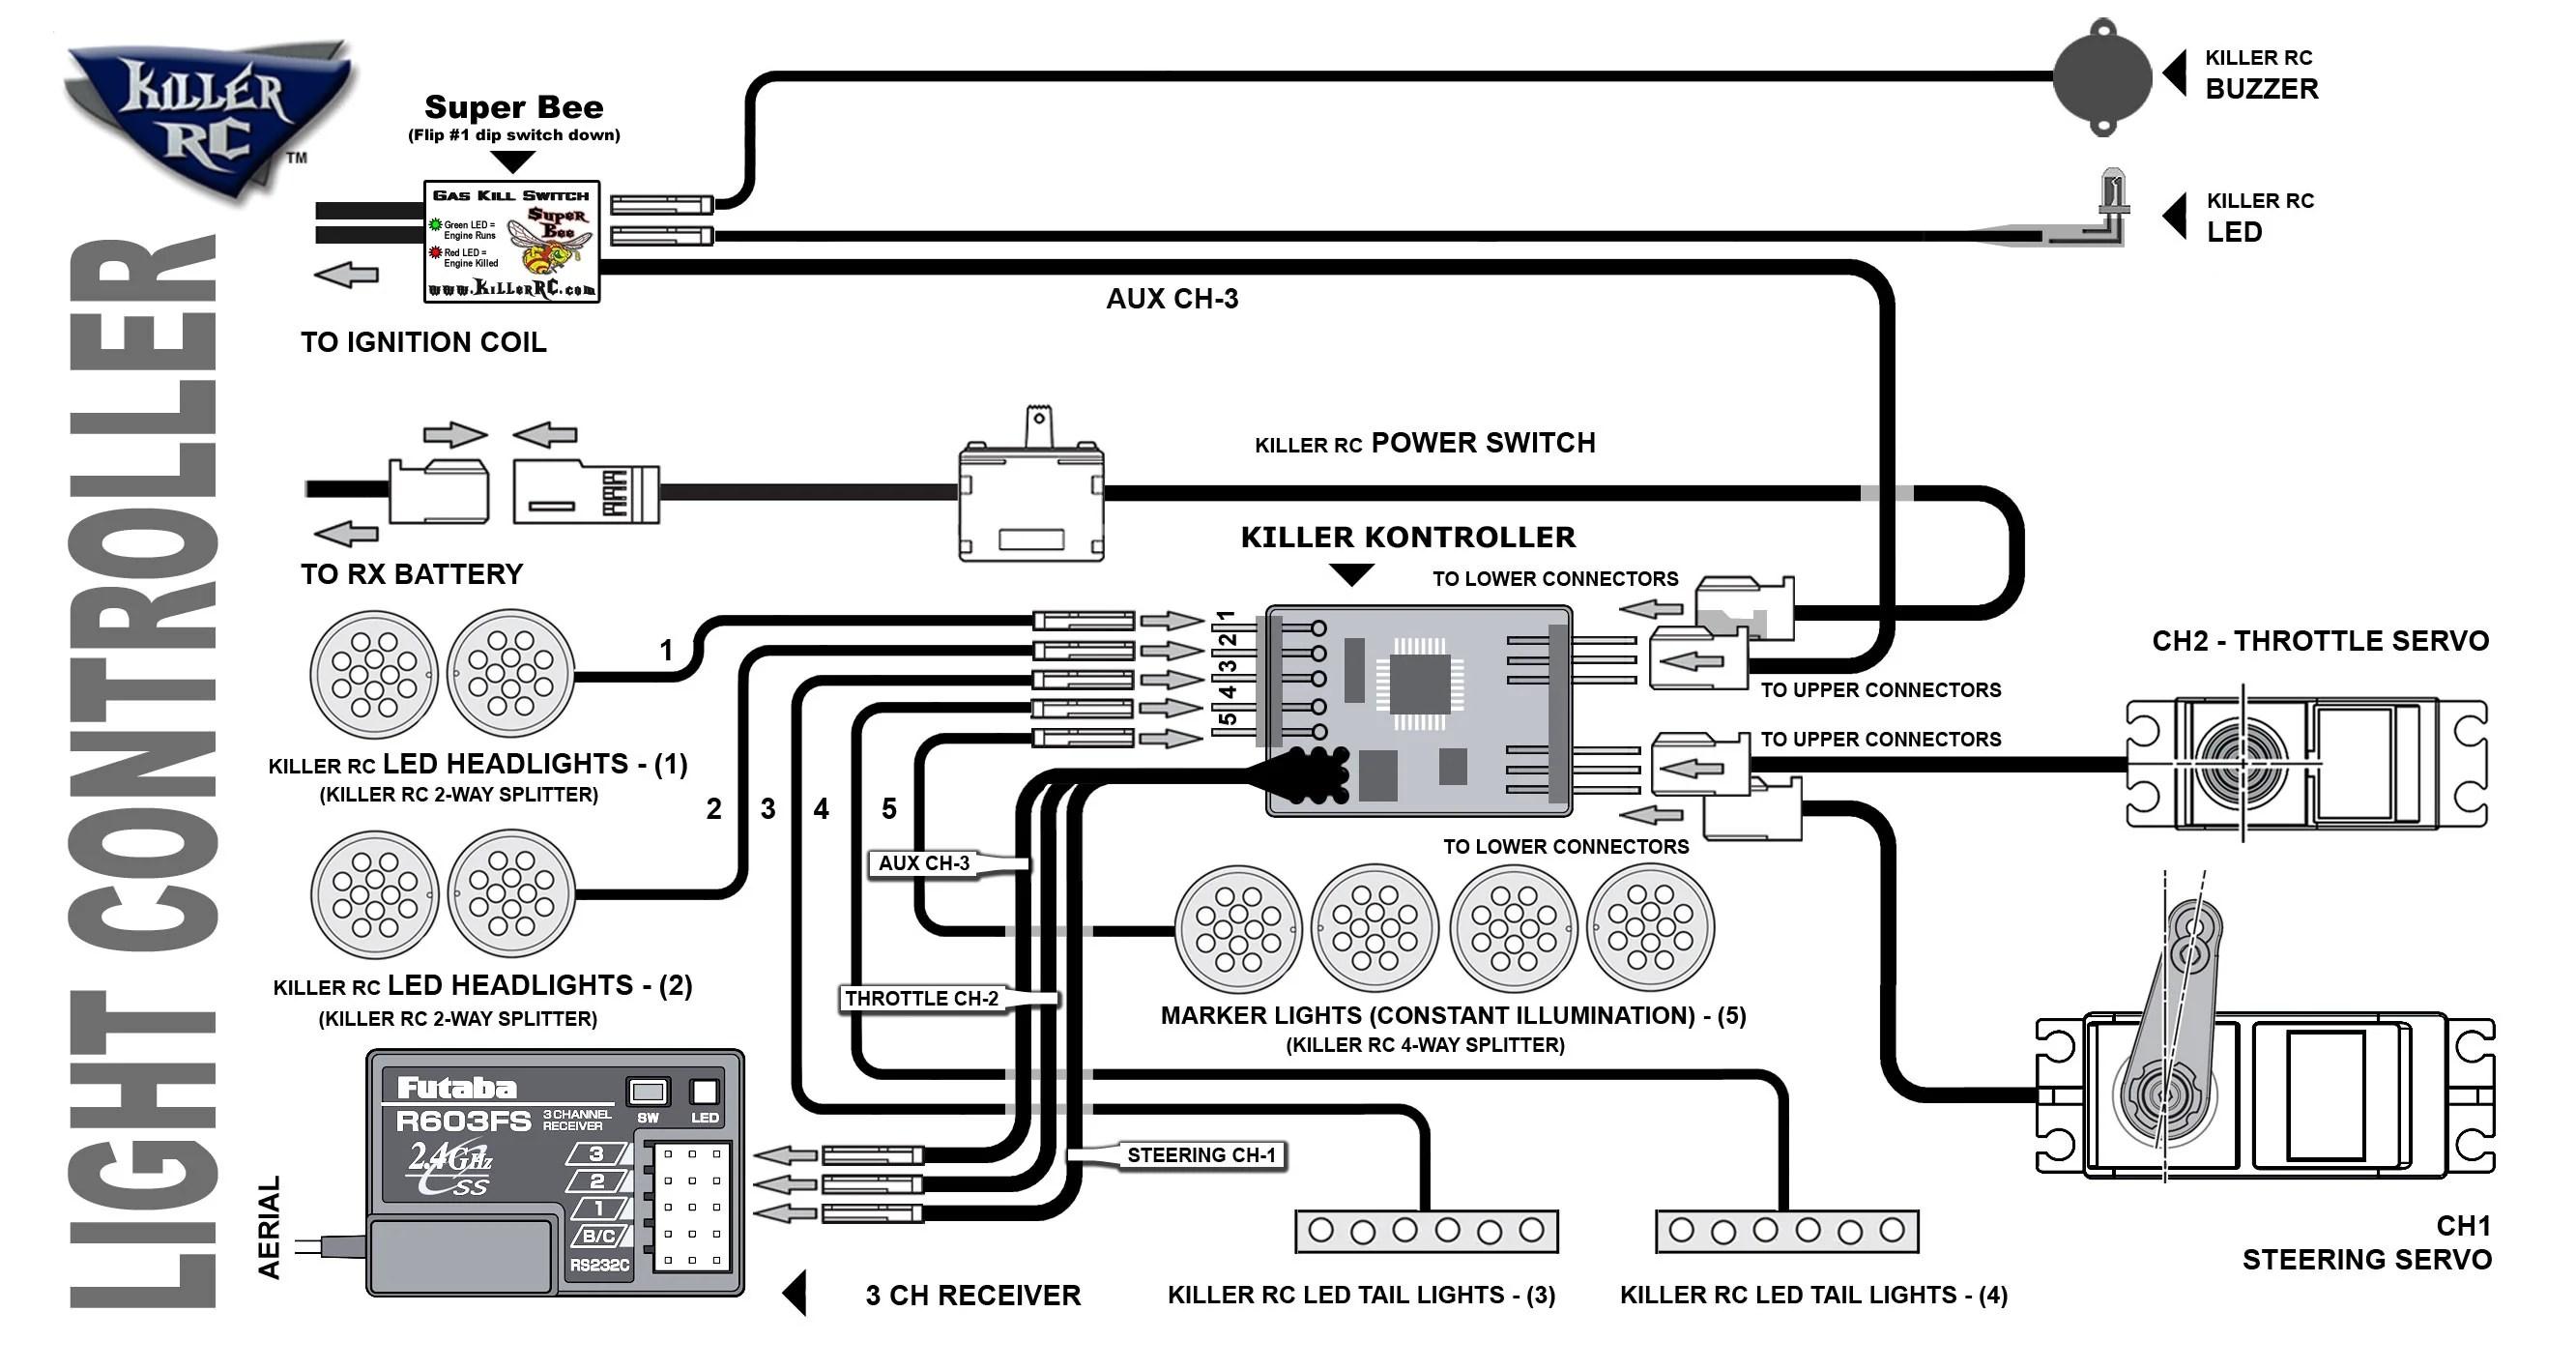 medium resolution of light controller diagram killer controller v3 3 channel configuration